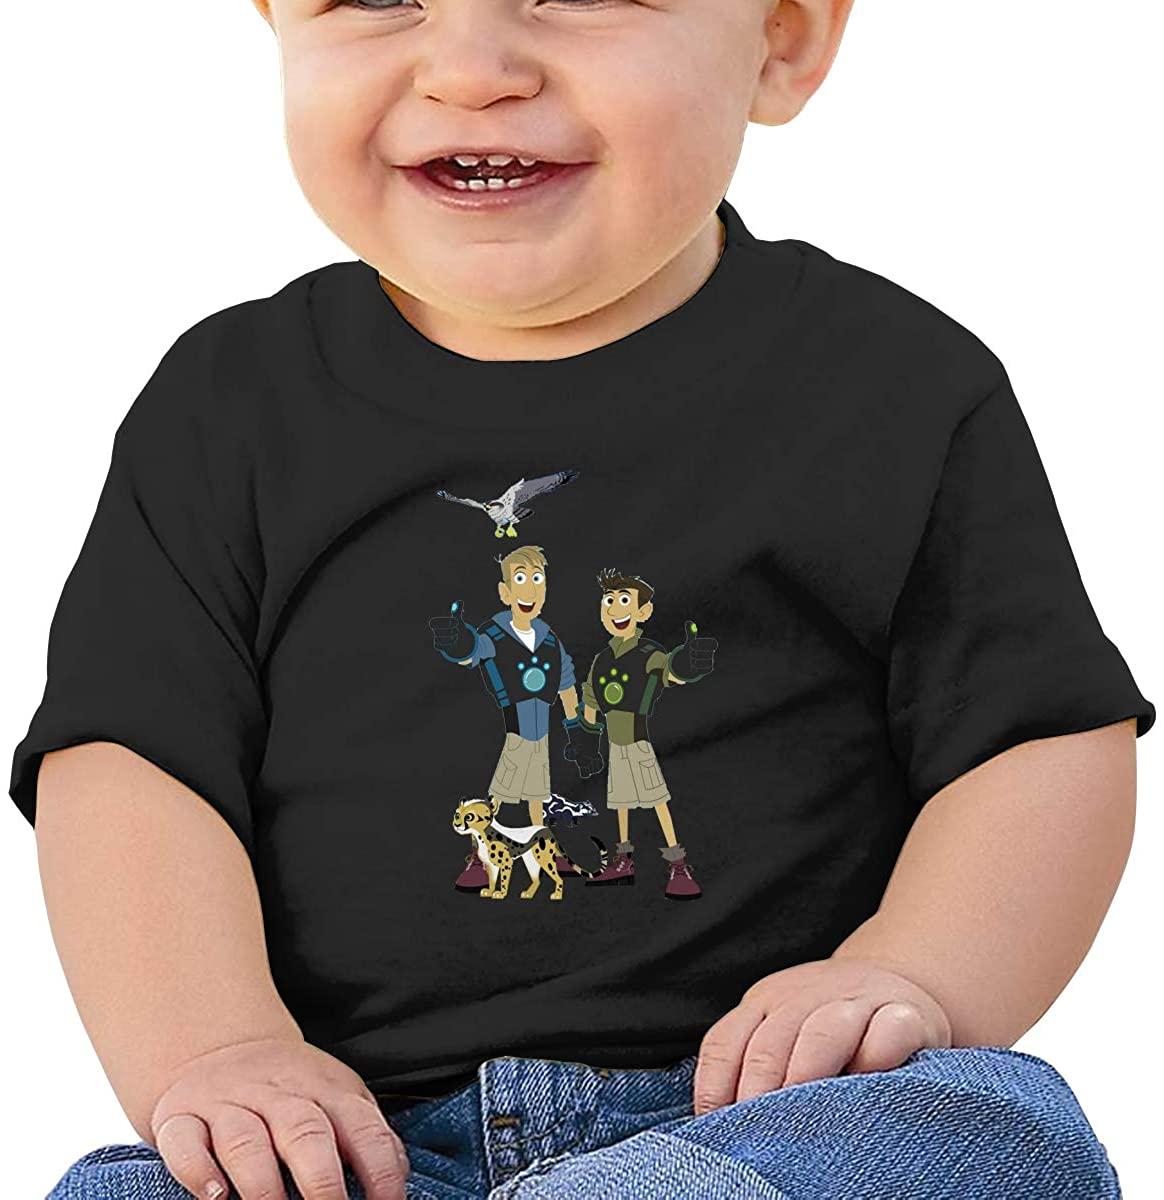 6-24 Months Boy and Girl Baby Short Sleeve T-Shirt Wild Kratts Logo Original Minimalist Style Black